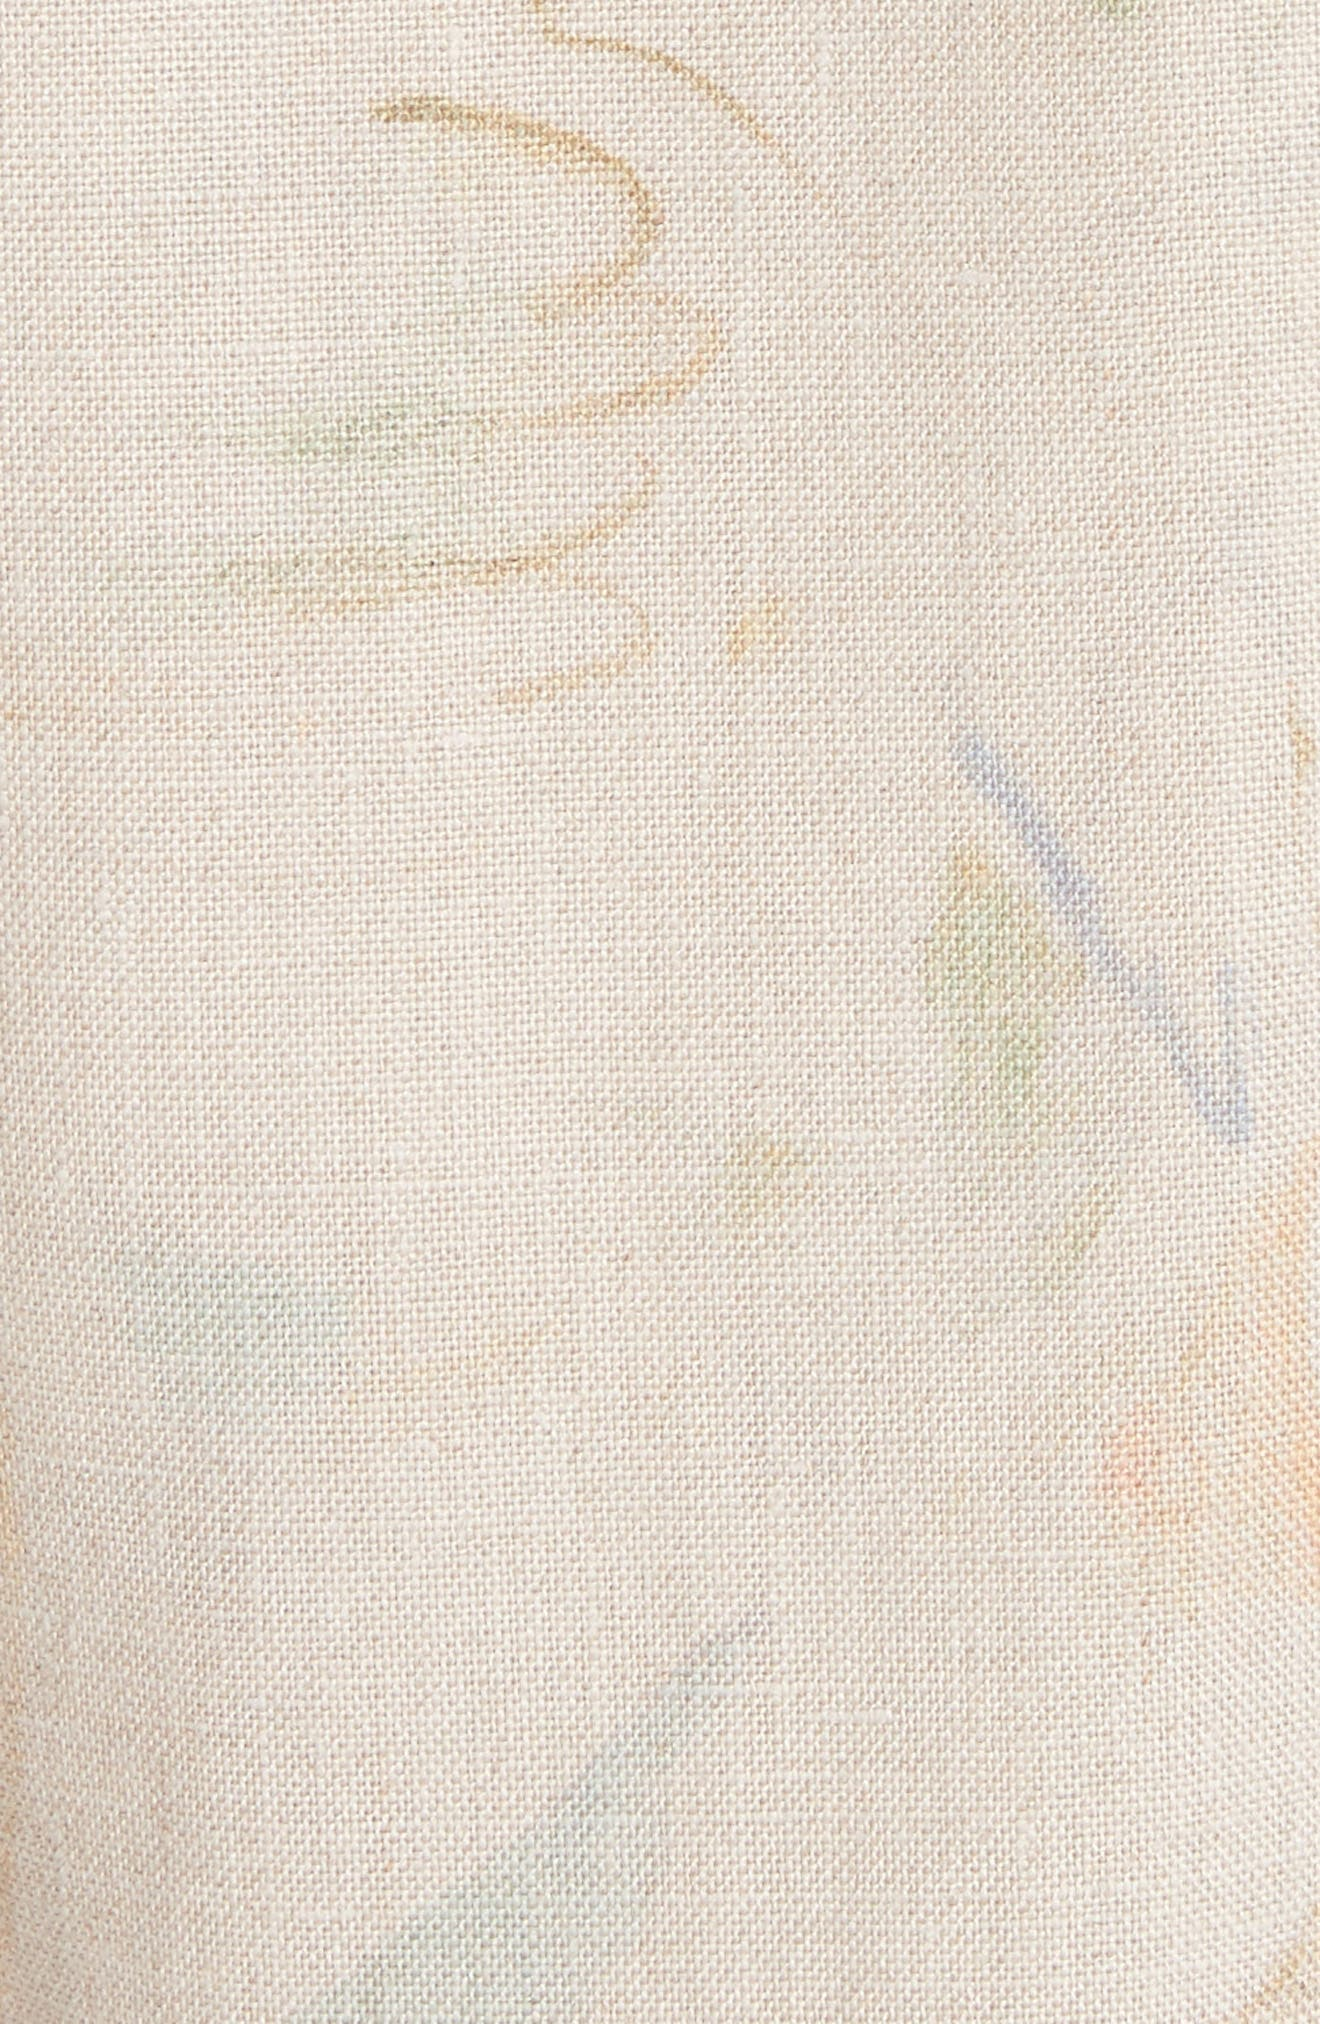 Laurita Linen Trench Coat,                             Alternate thumbnail 6, color,                             292